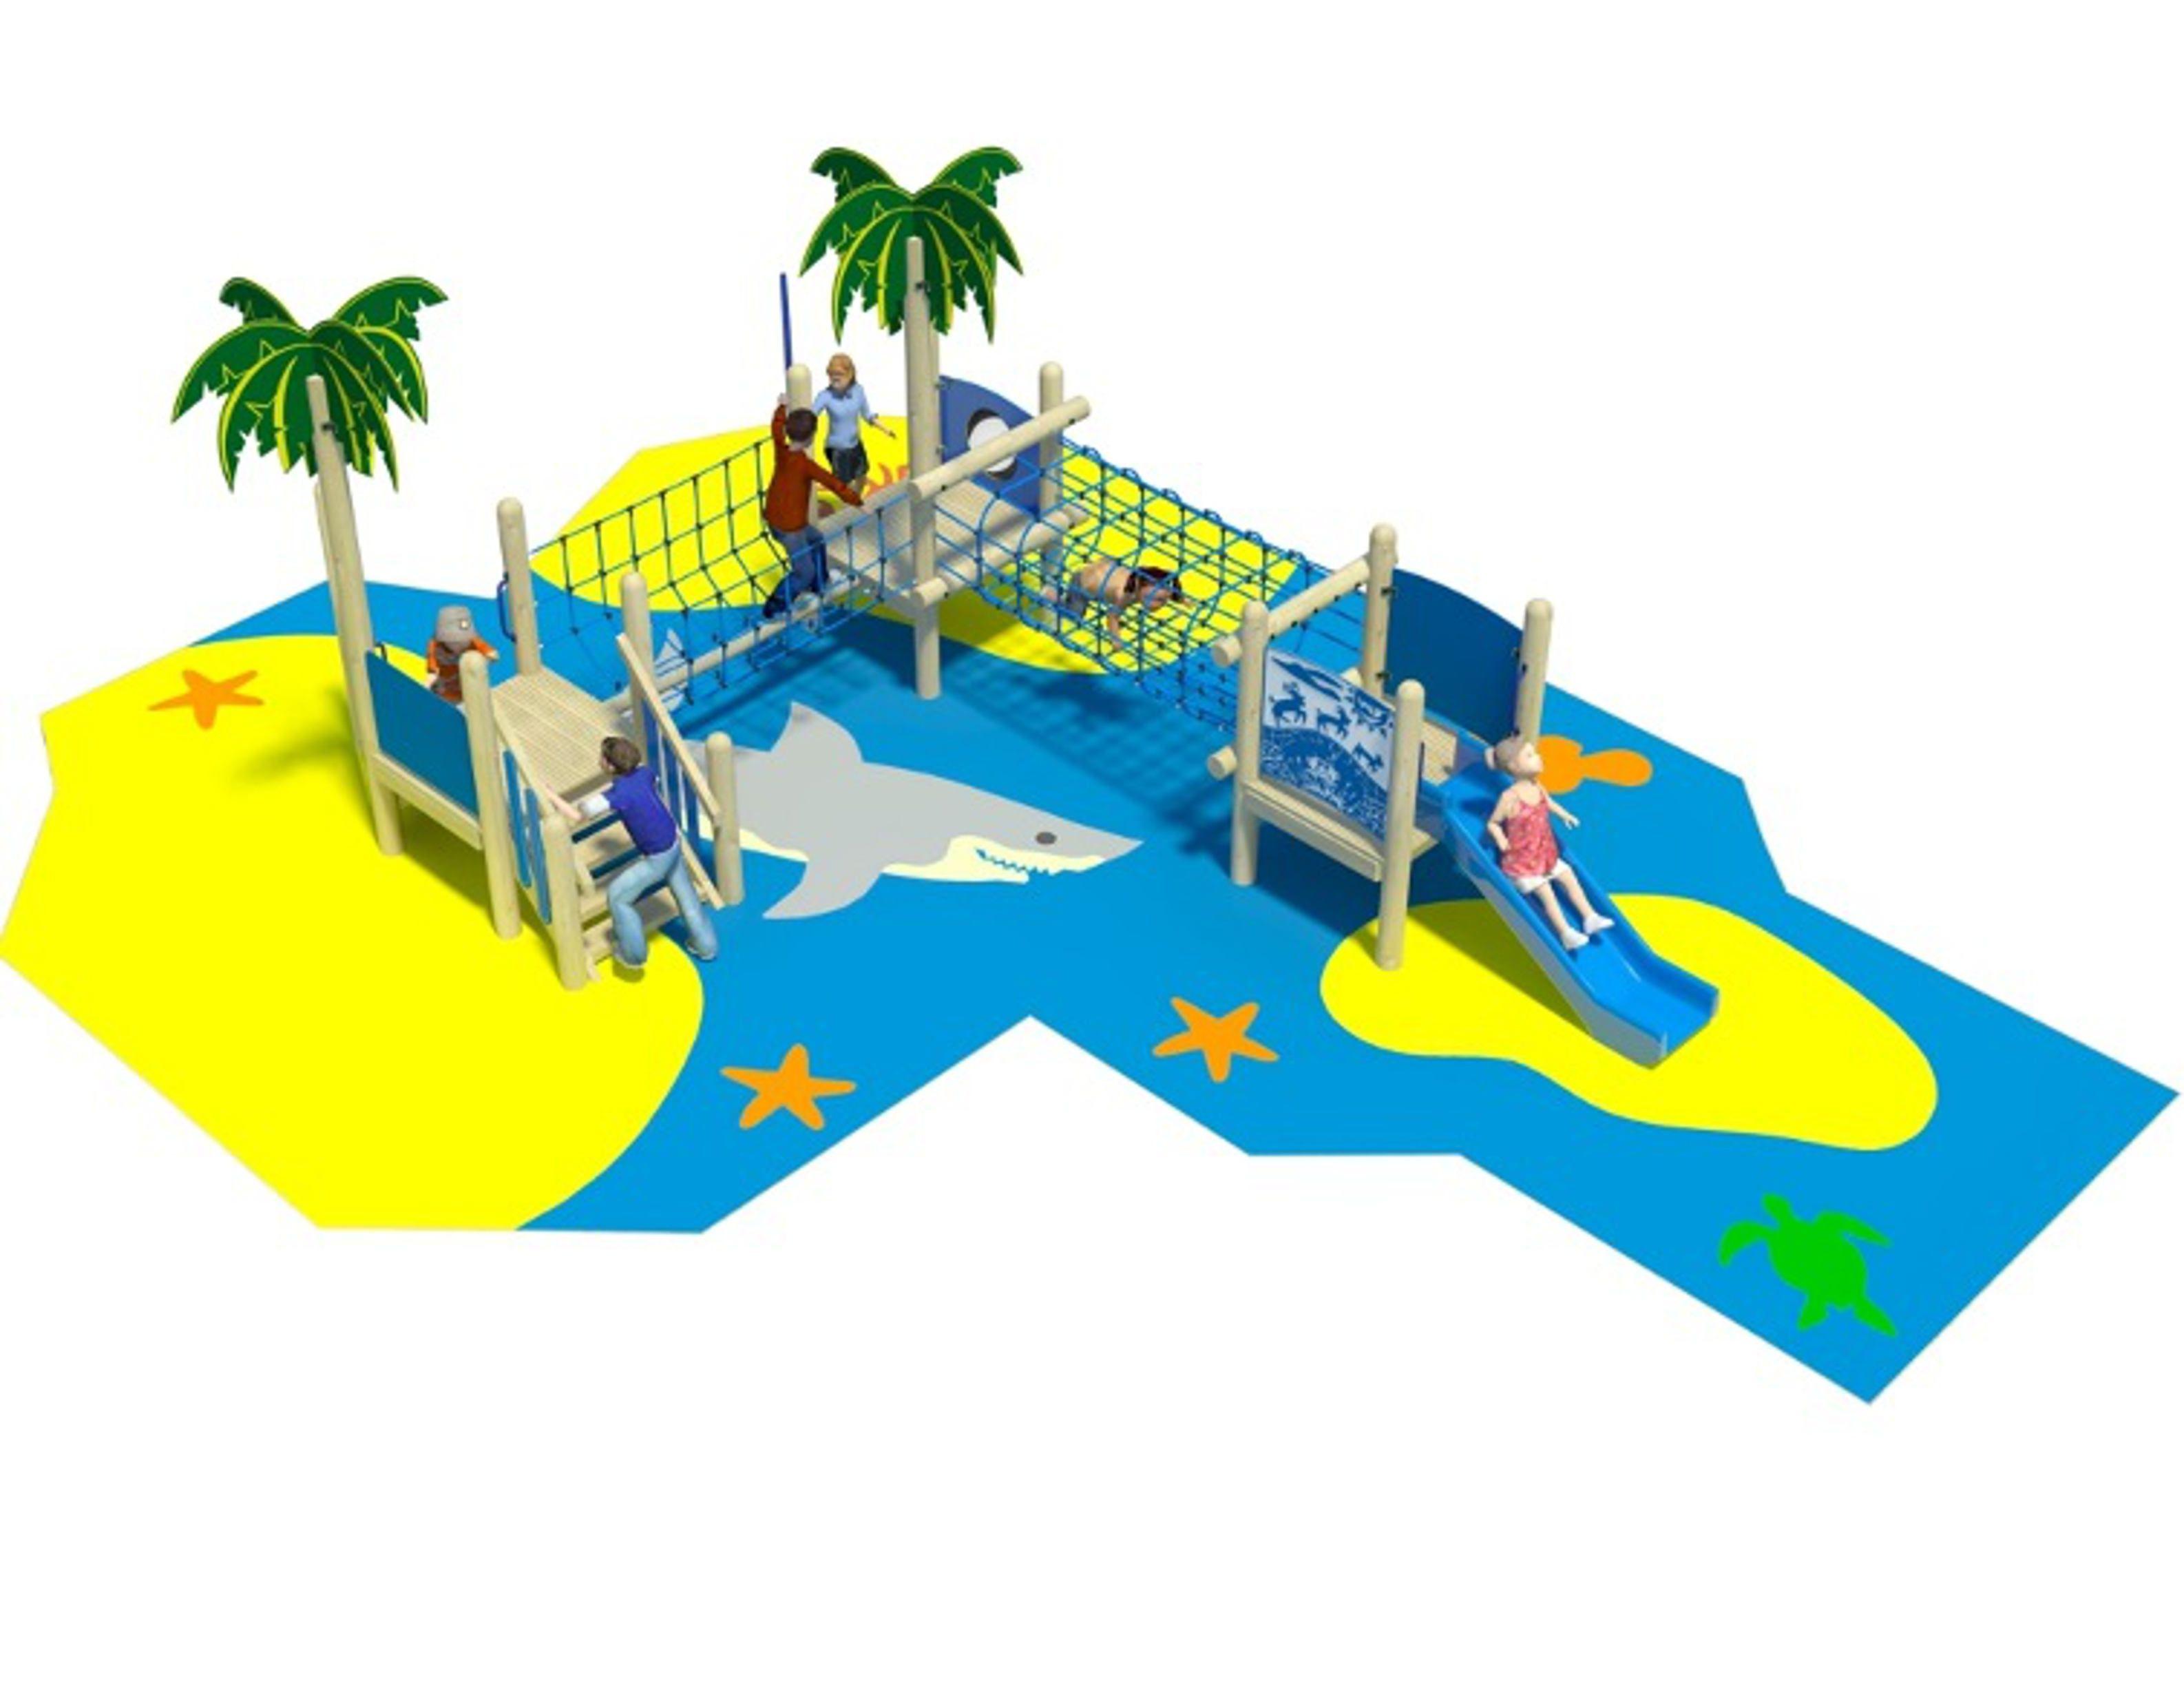 Pin by Gemma Powell on Playground design Playground